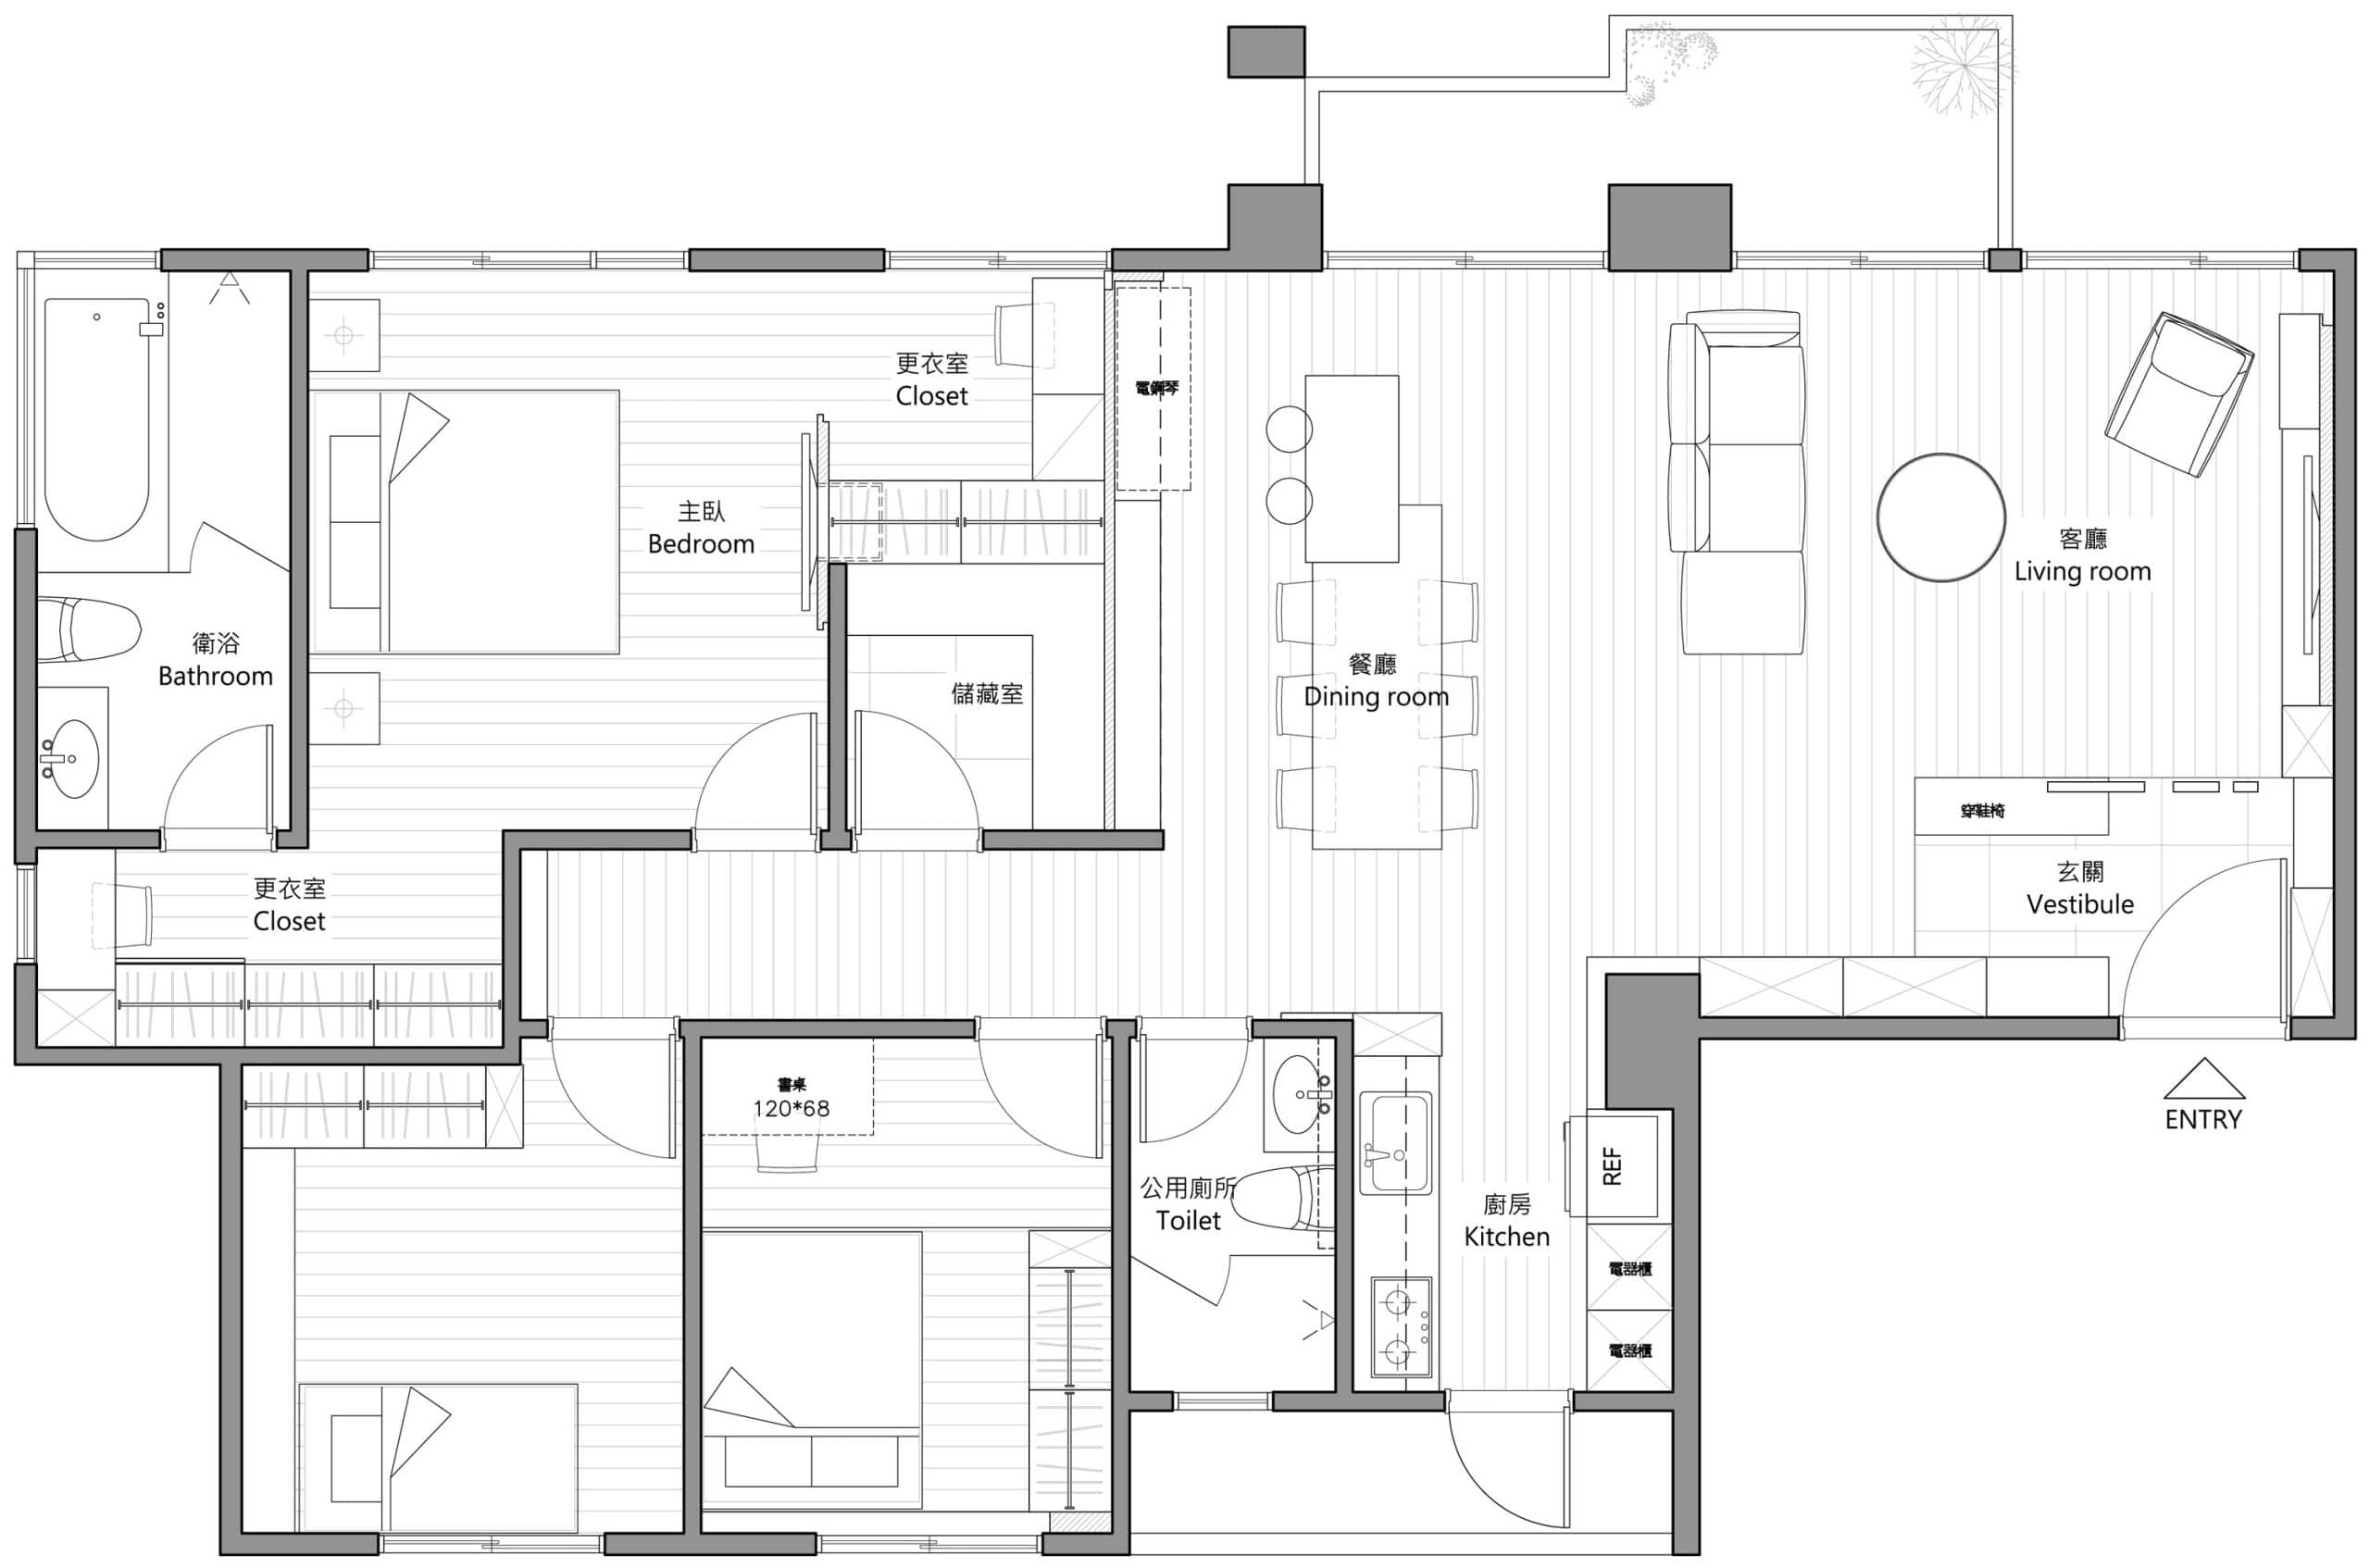 Plano y dise o de interiores departamento construye hogar for Planos de casas modernas de 3 dormitorios